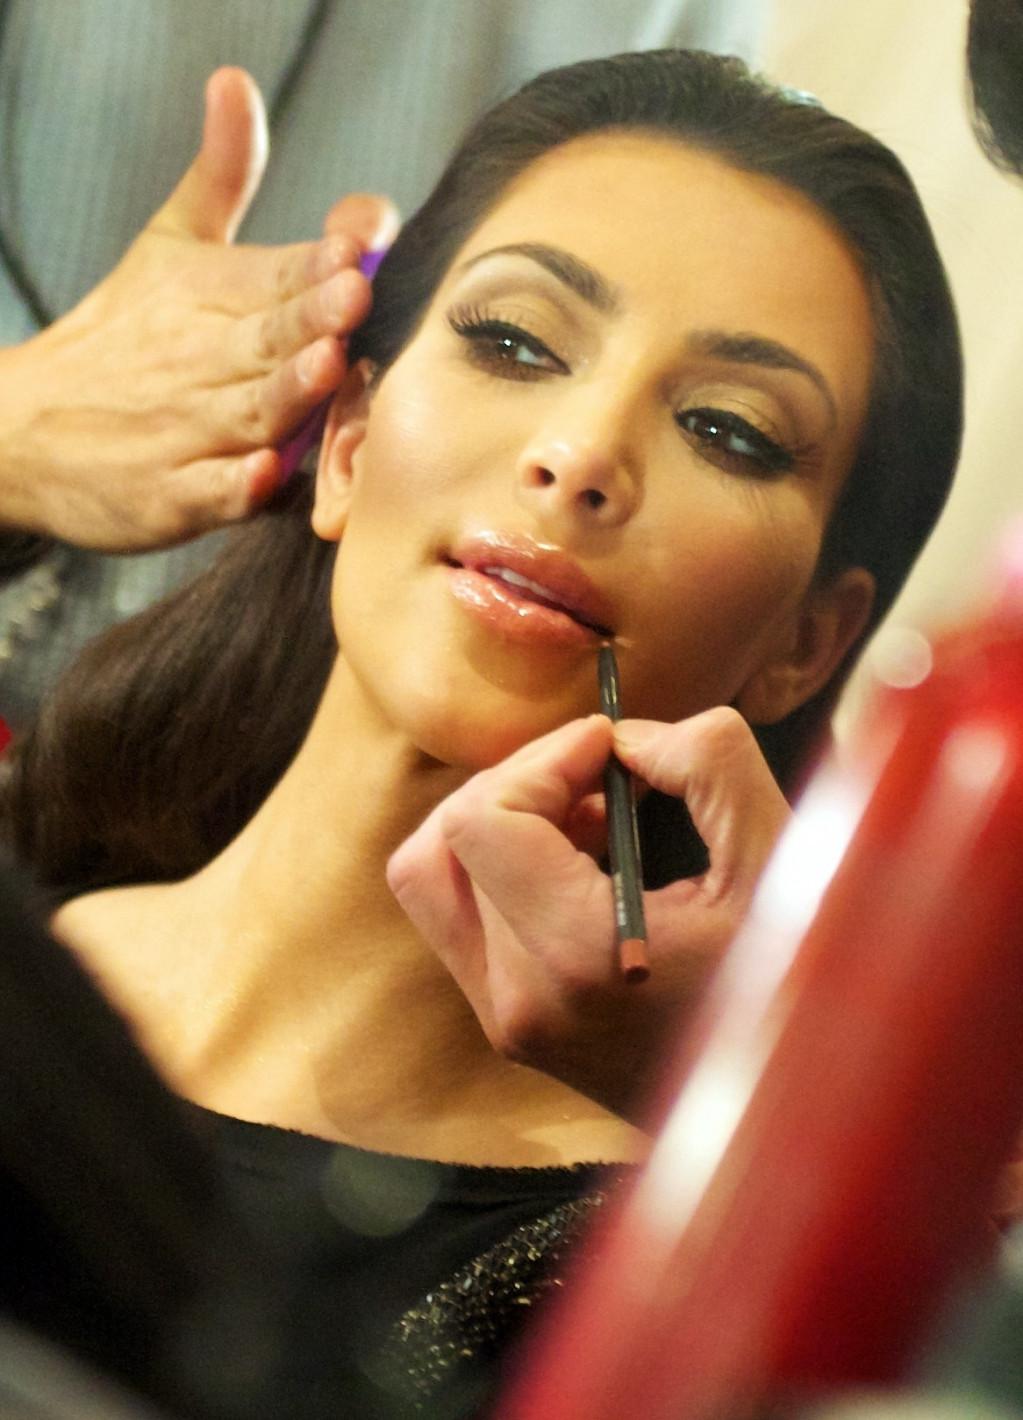 Hvordan gør Kim Kardashian? Se her!